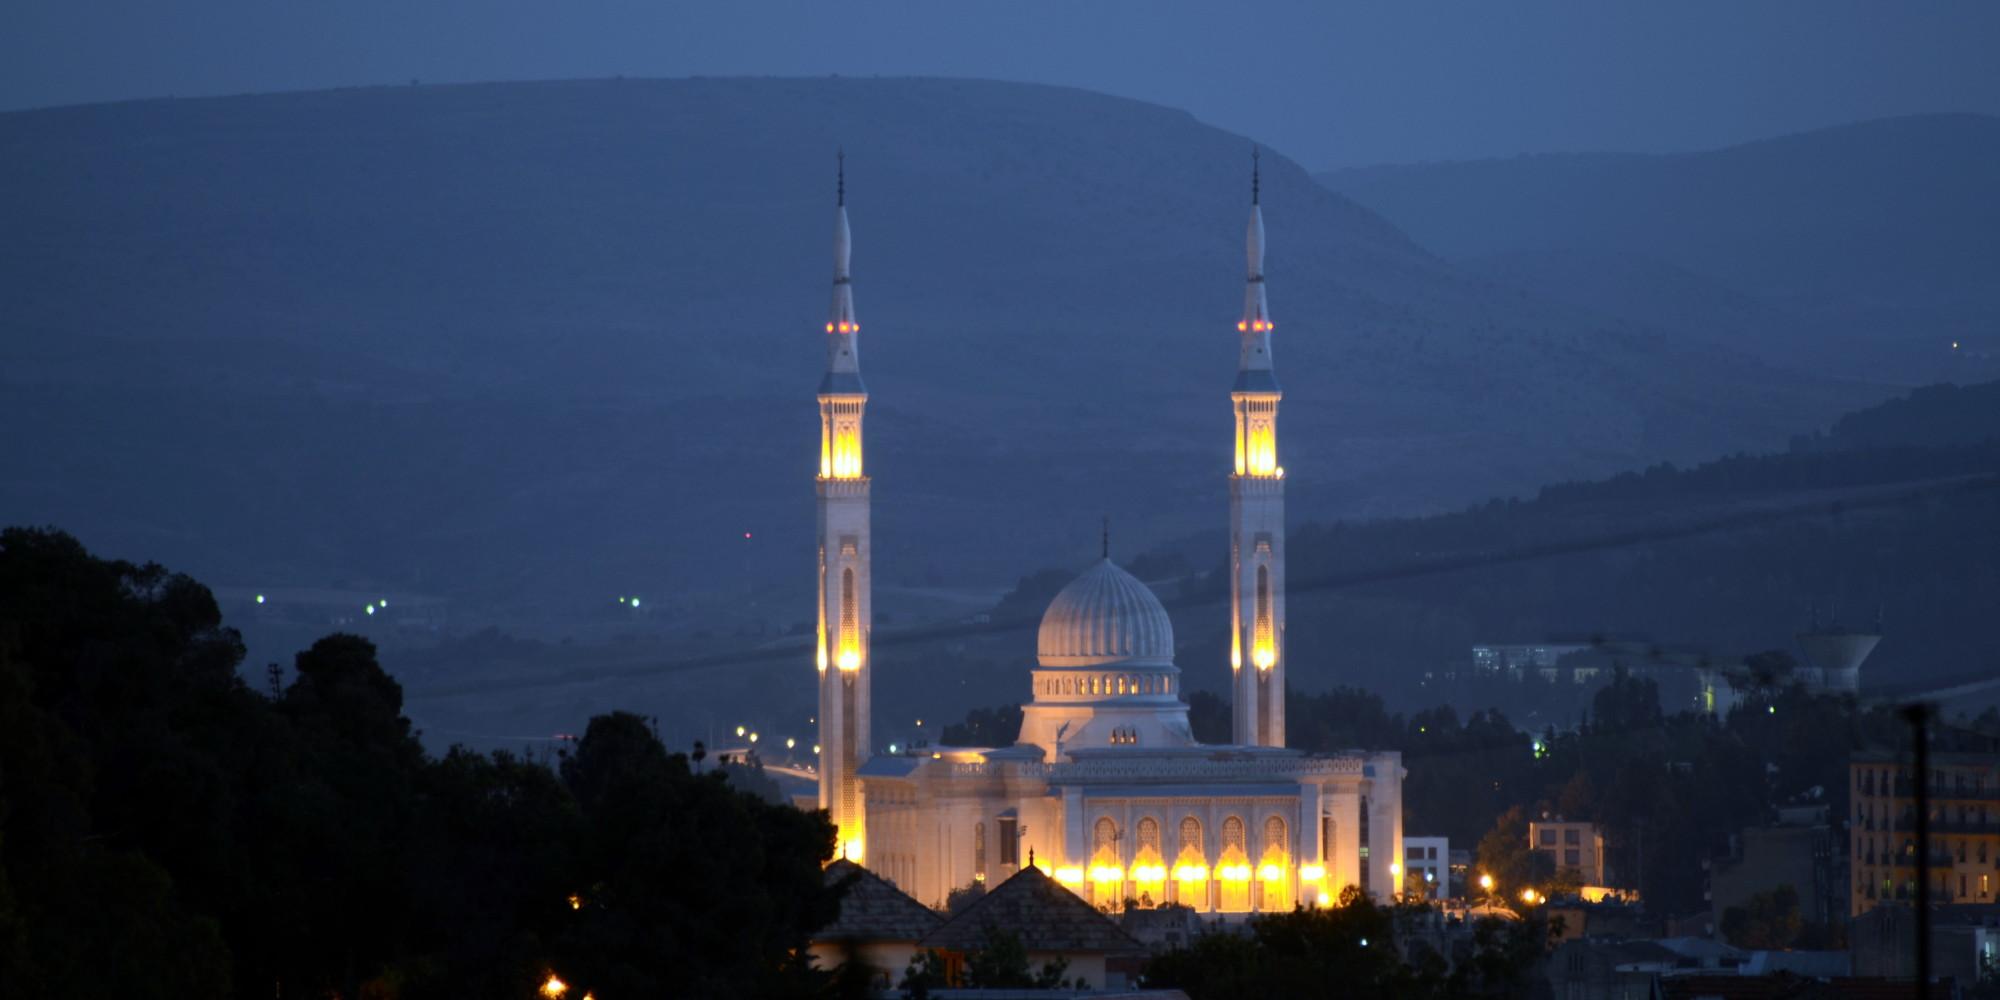 Constantine_grande_mosquee_emir_abdelkader-nuit-2